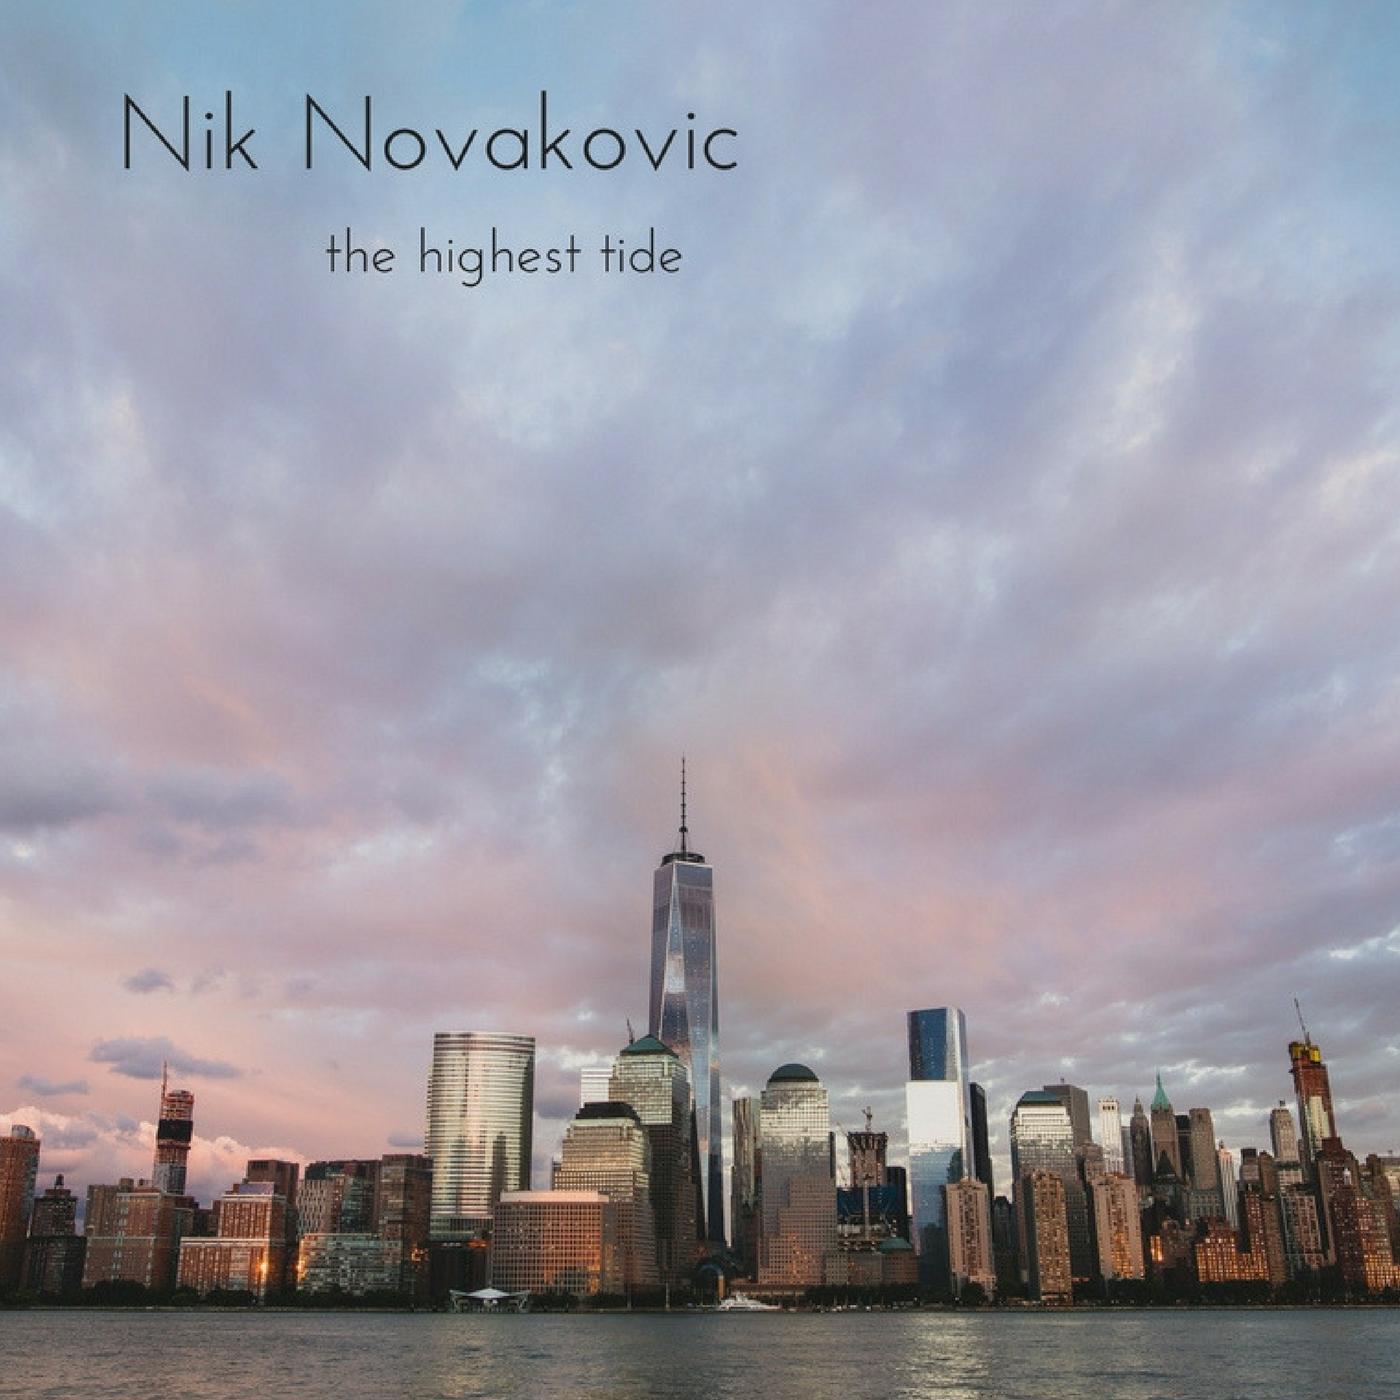 nik_novakovic cover reverbnation.png